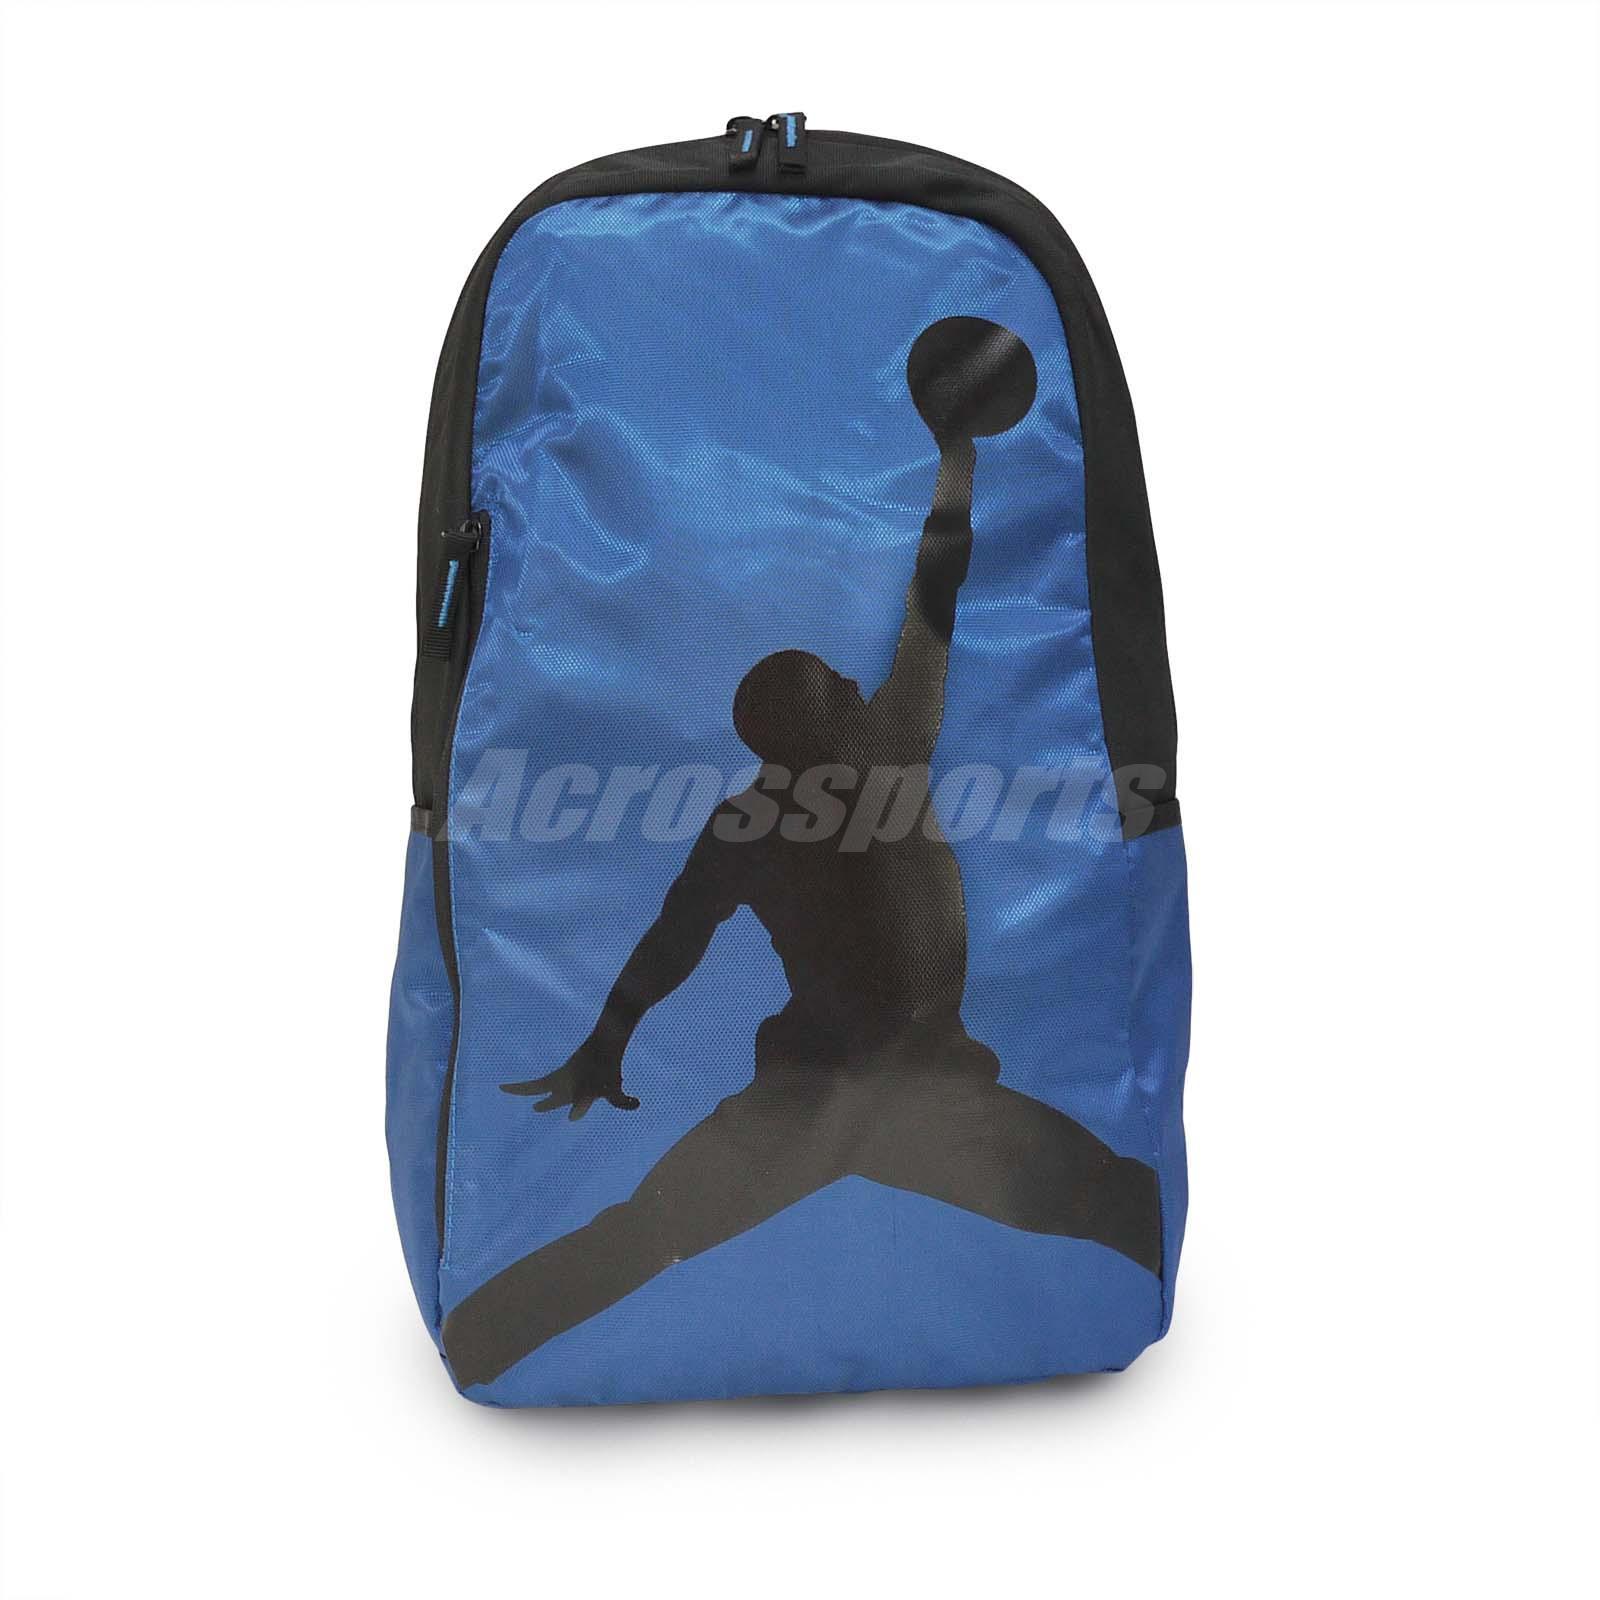 Nike Air Jordan Crossover Pack 24L Blue Black